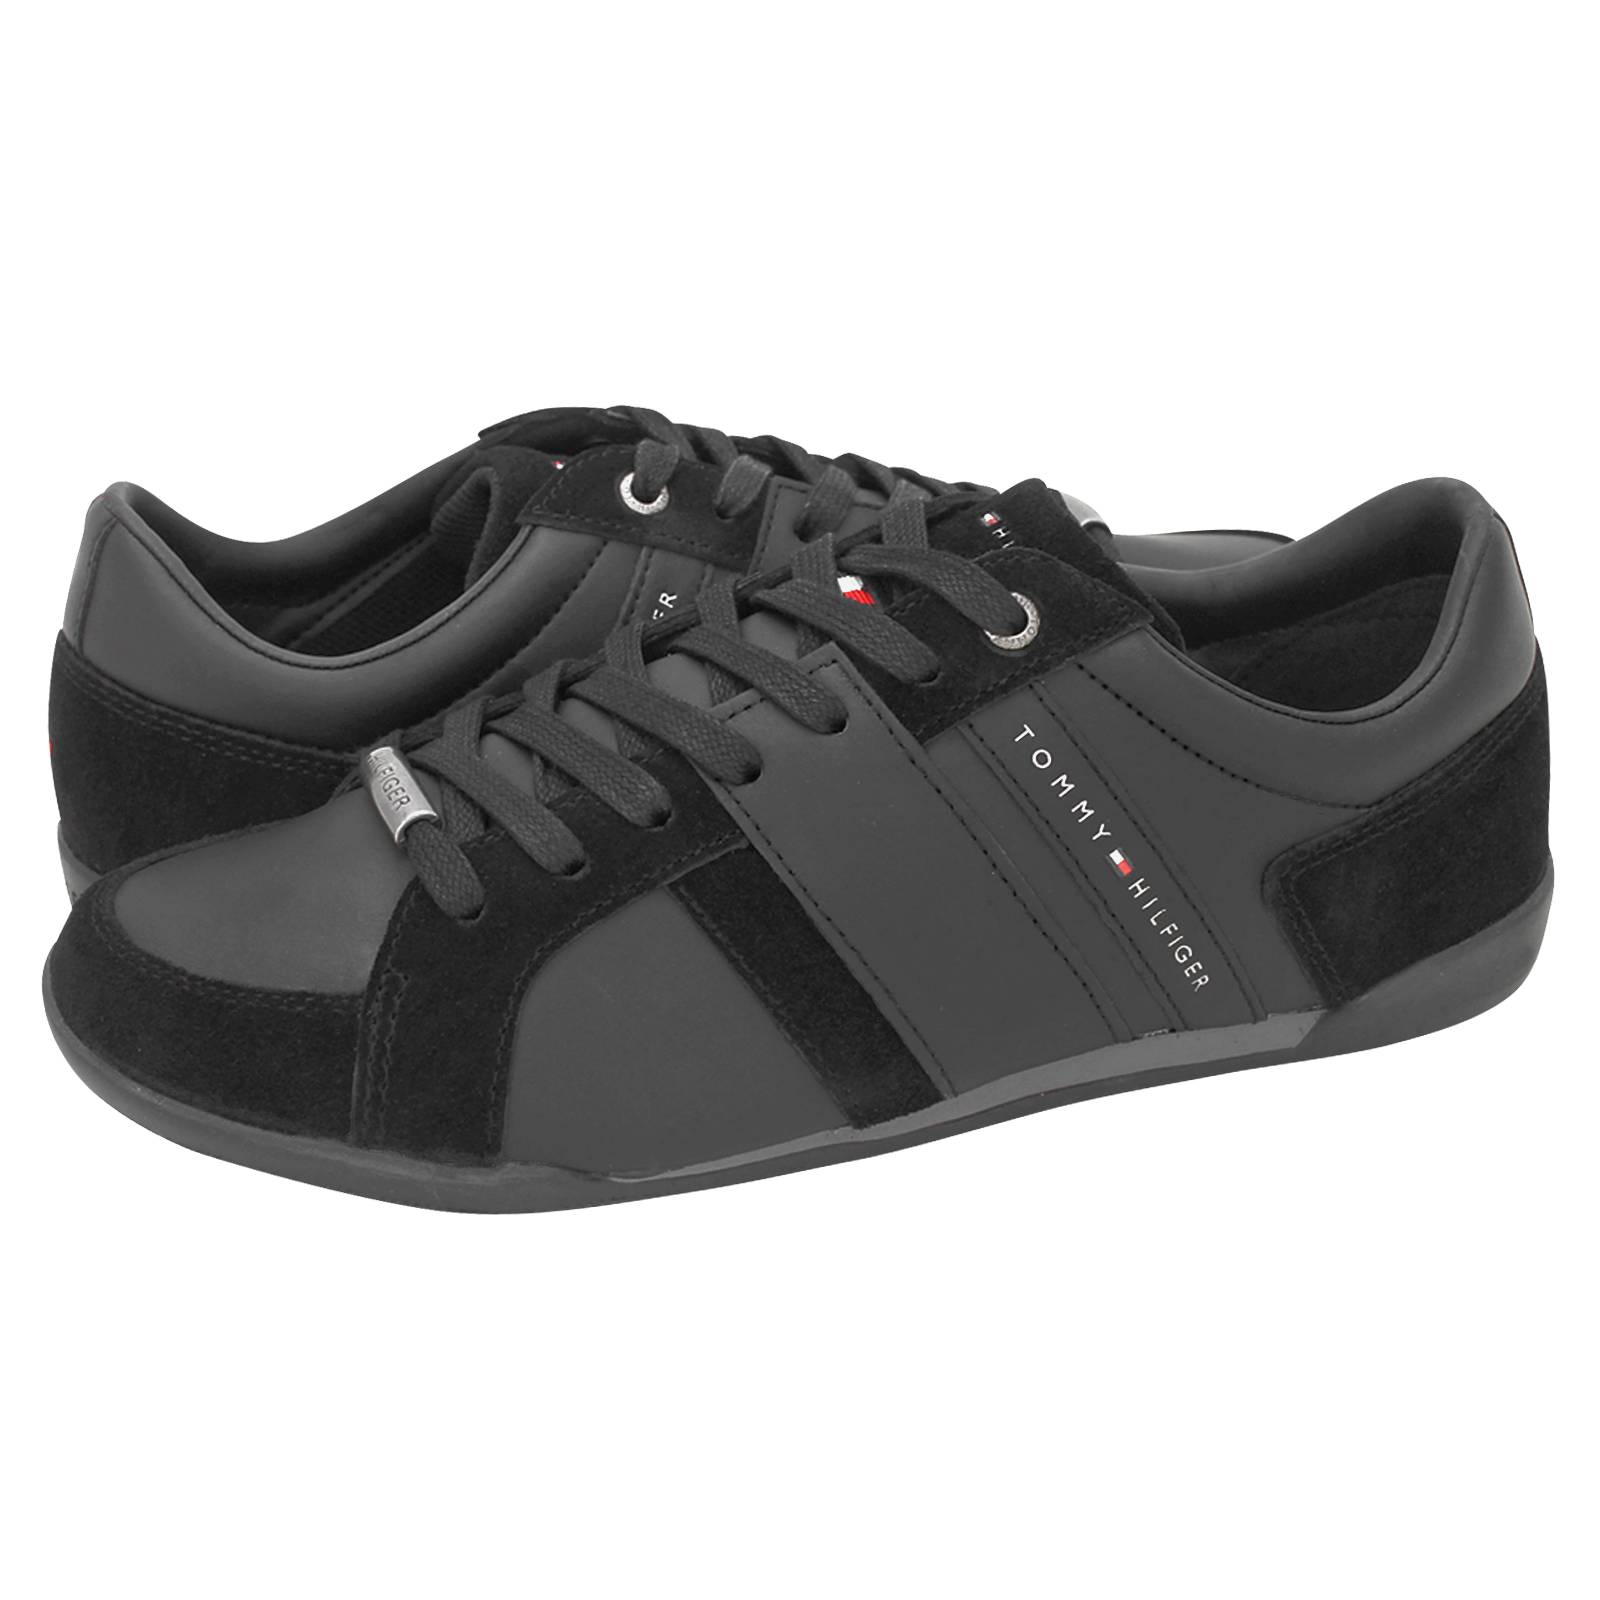 544dadc60c Royal 3C4 - Ανδρικά παπούτσια casual Tommy Hilfiger από δερμα και ...